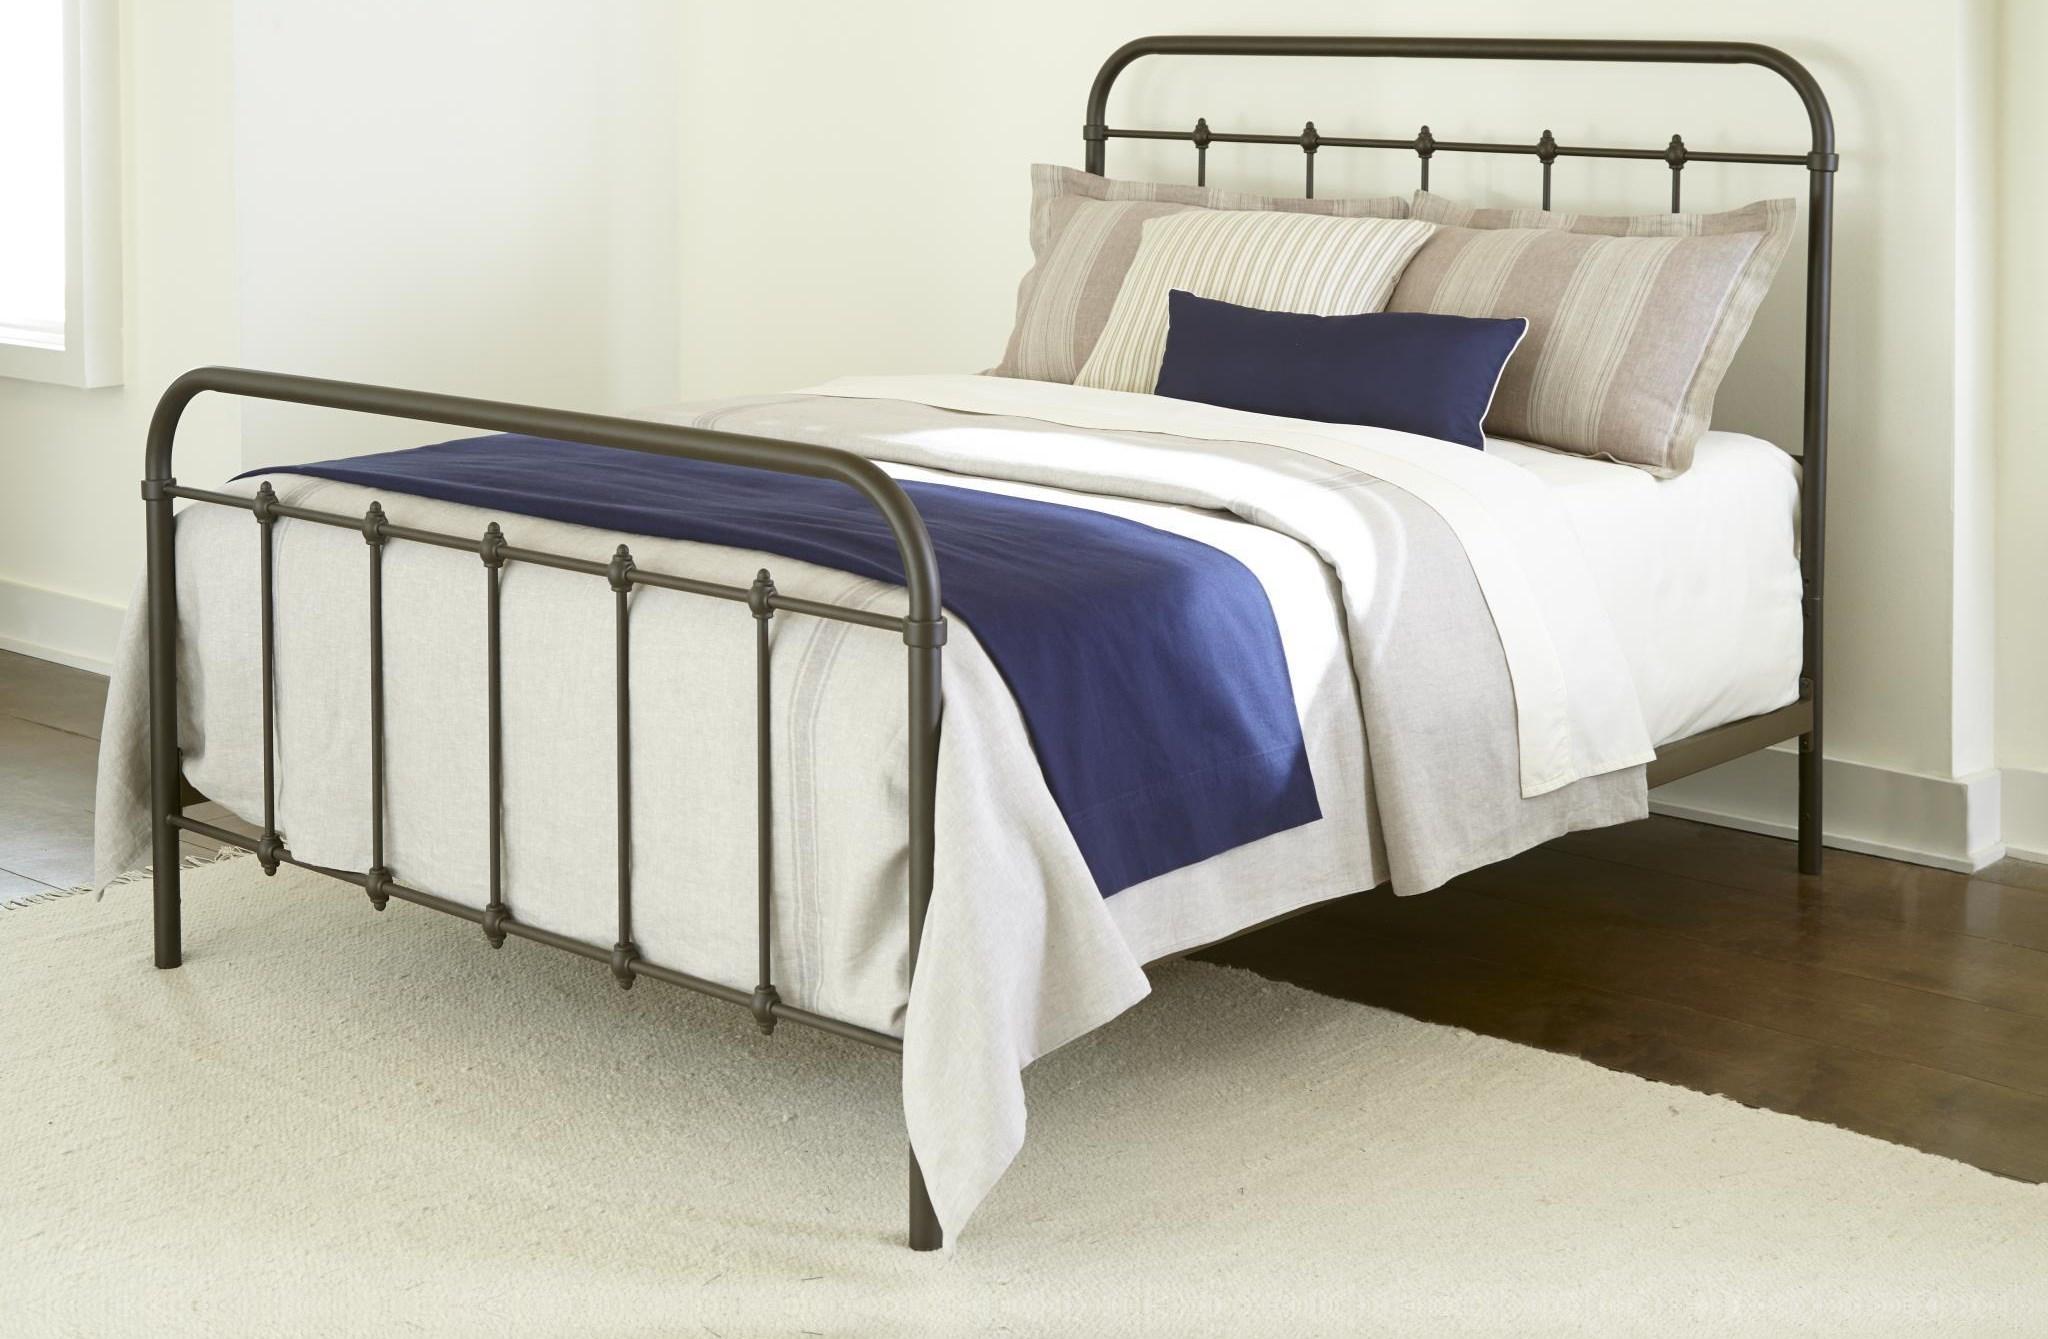 232Grey King Size Metal Bed by Kith Furniture at Furniture Fair - North Carolina